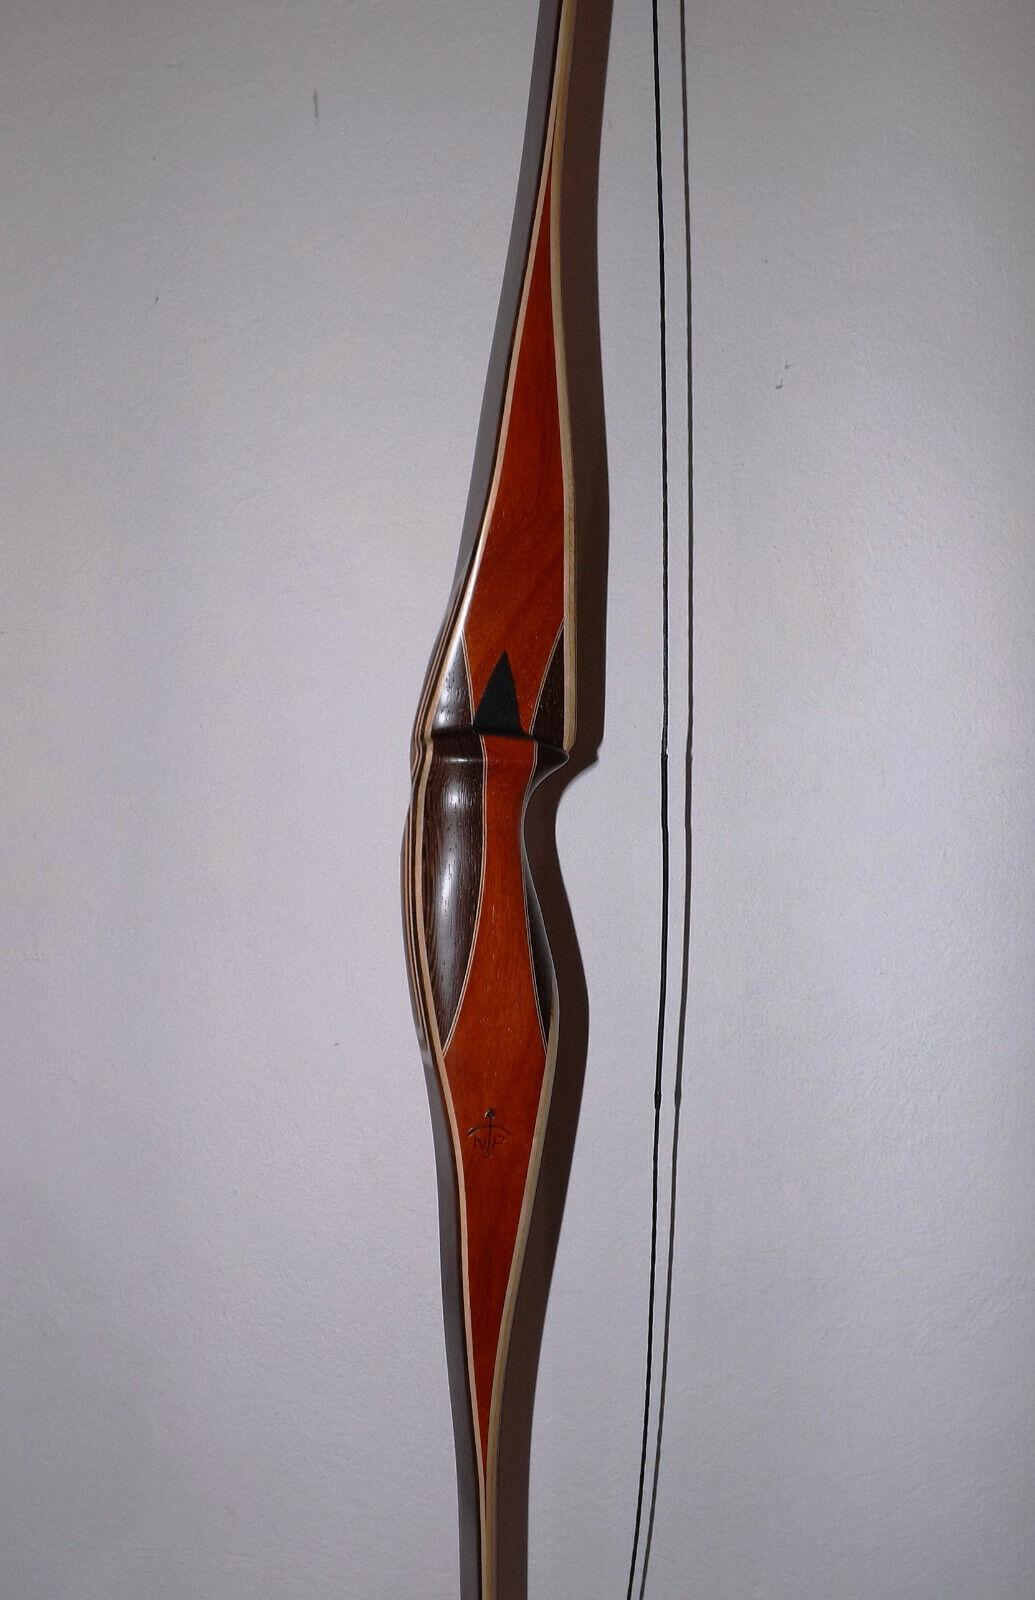 Arco largo Longbow Anubis plus 39 lbs Rh de Peter Nemeth